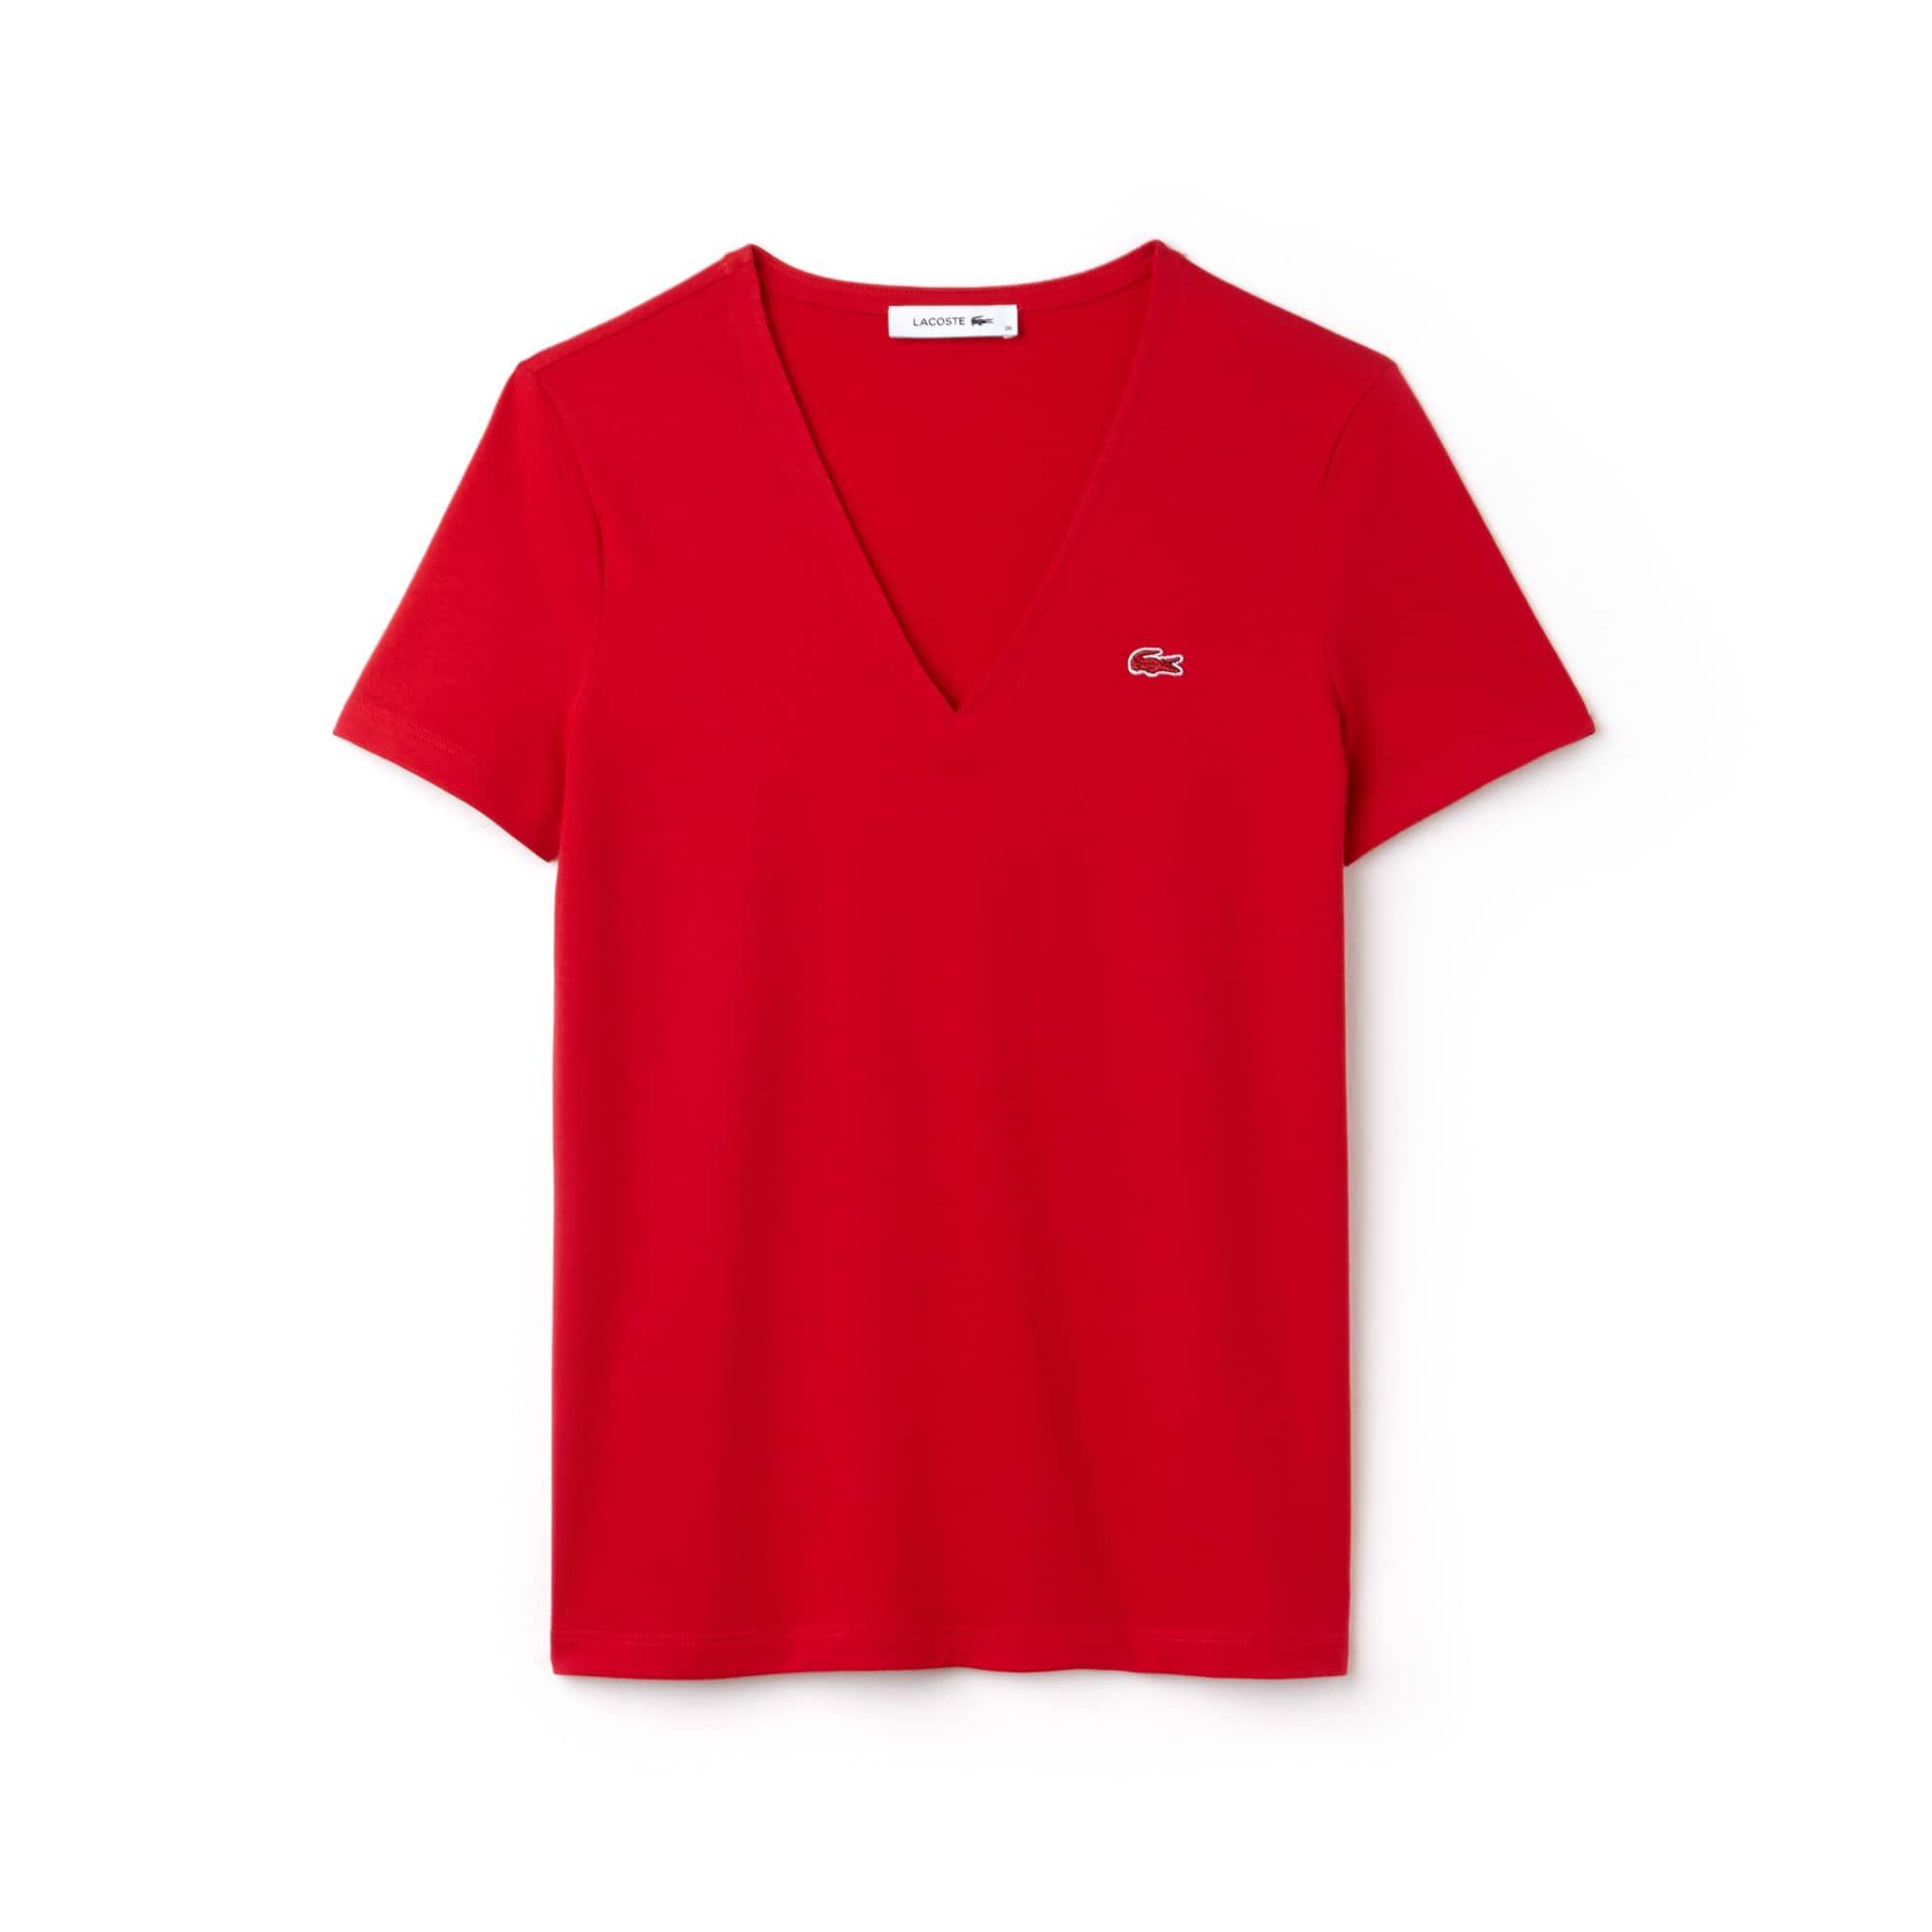 Cheap Red T-Shirts